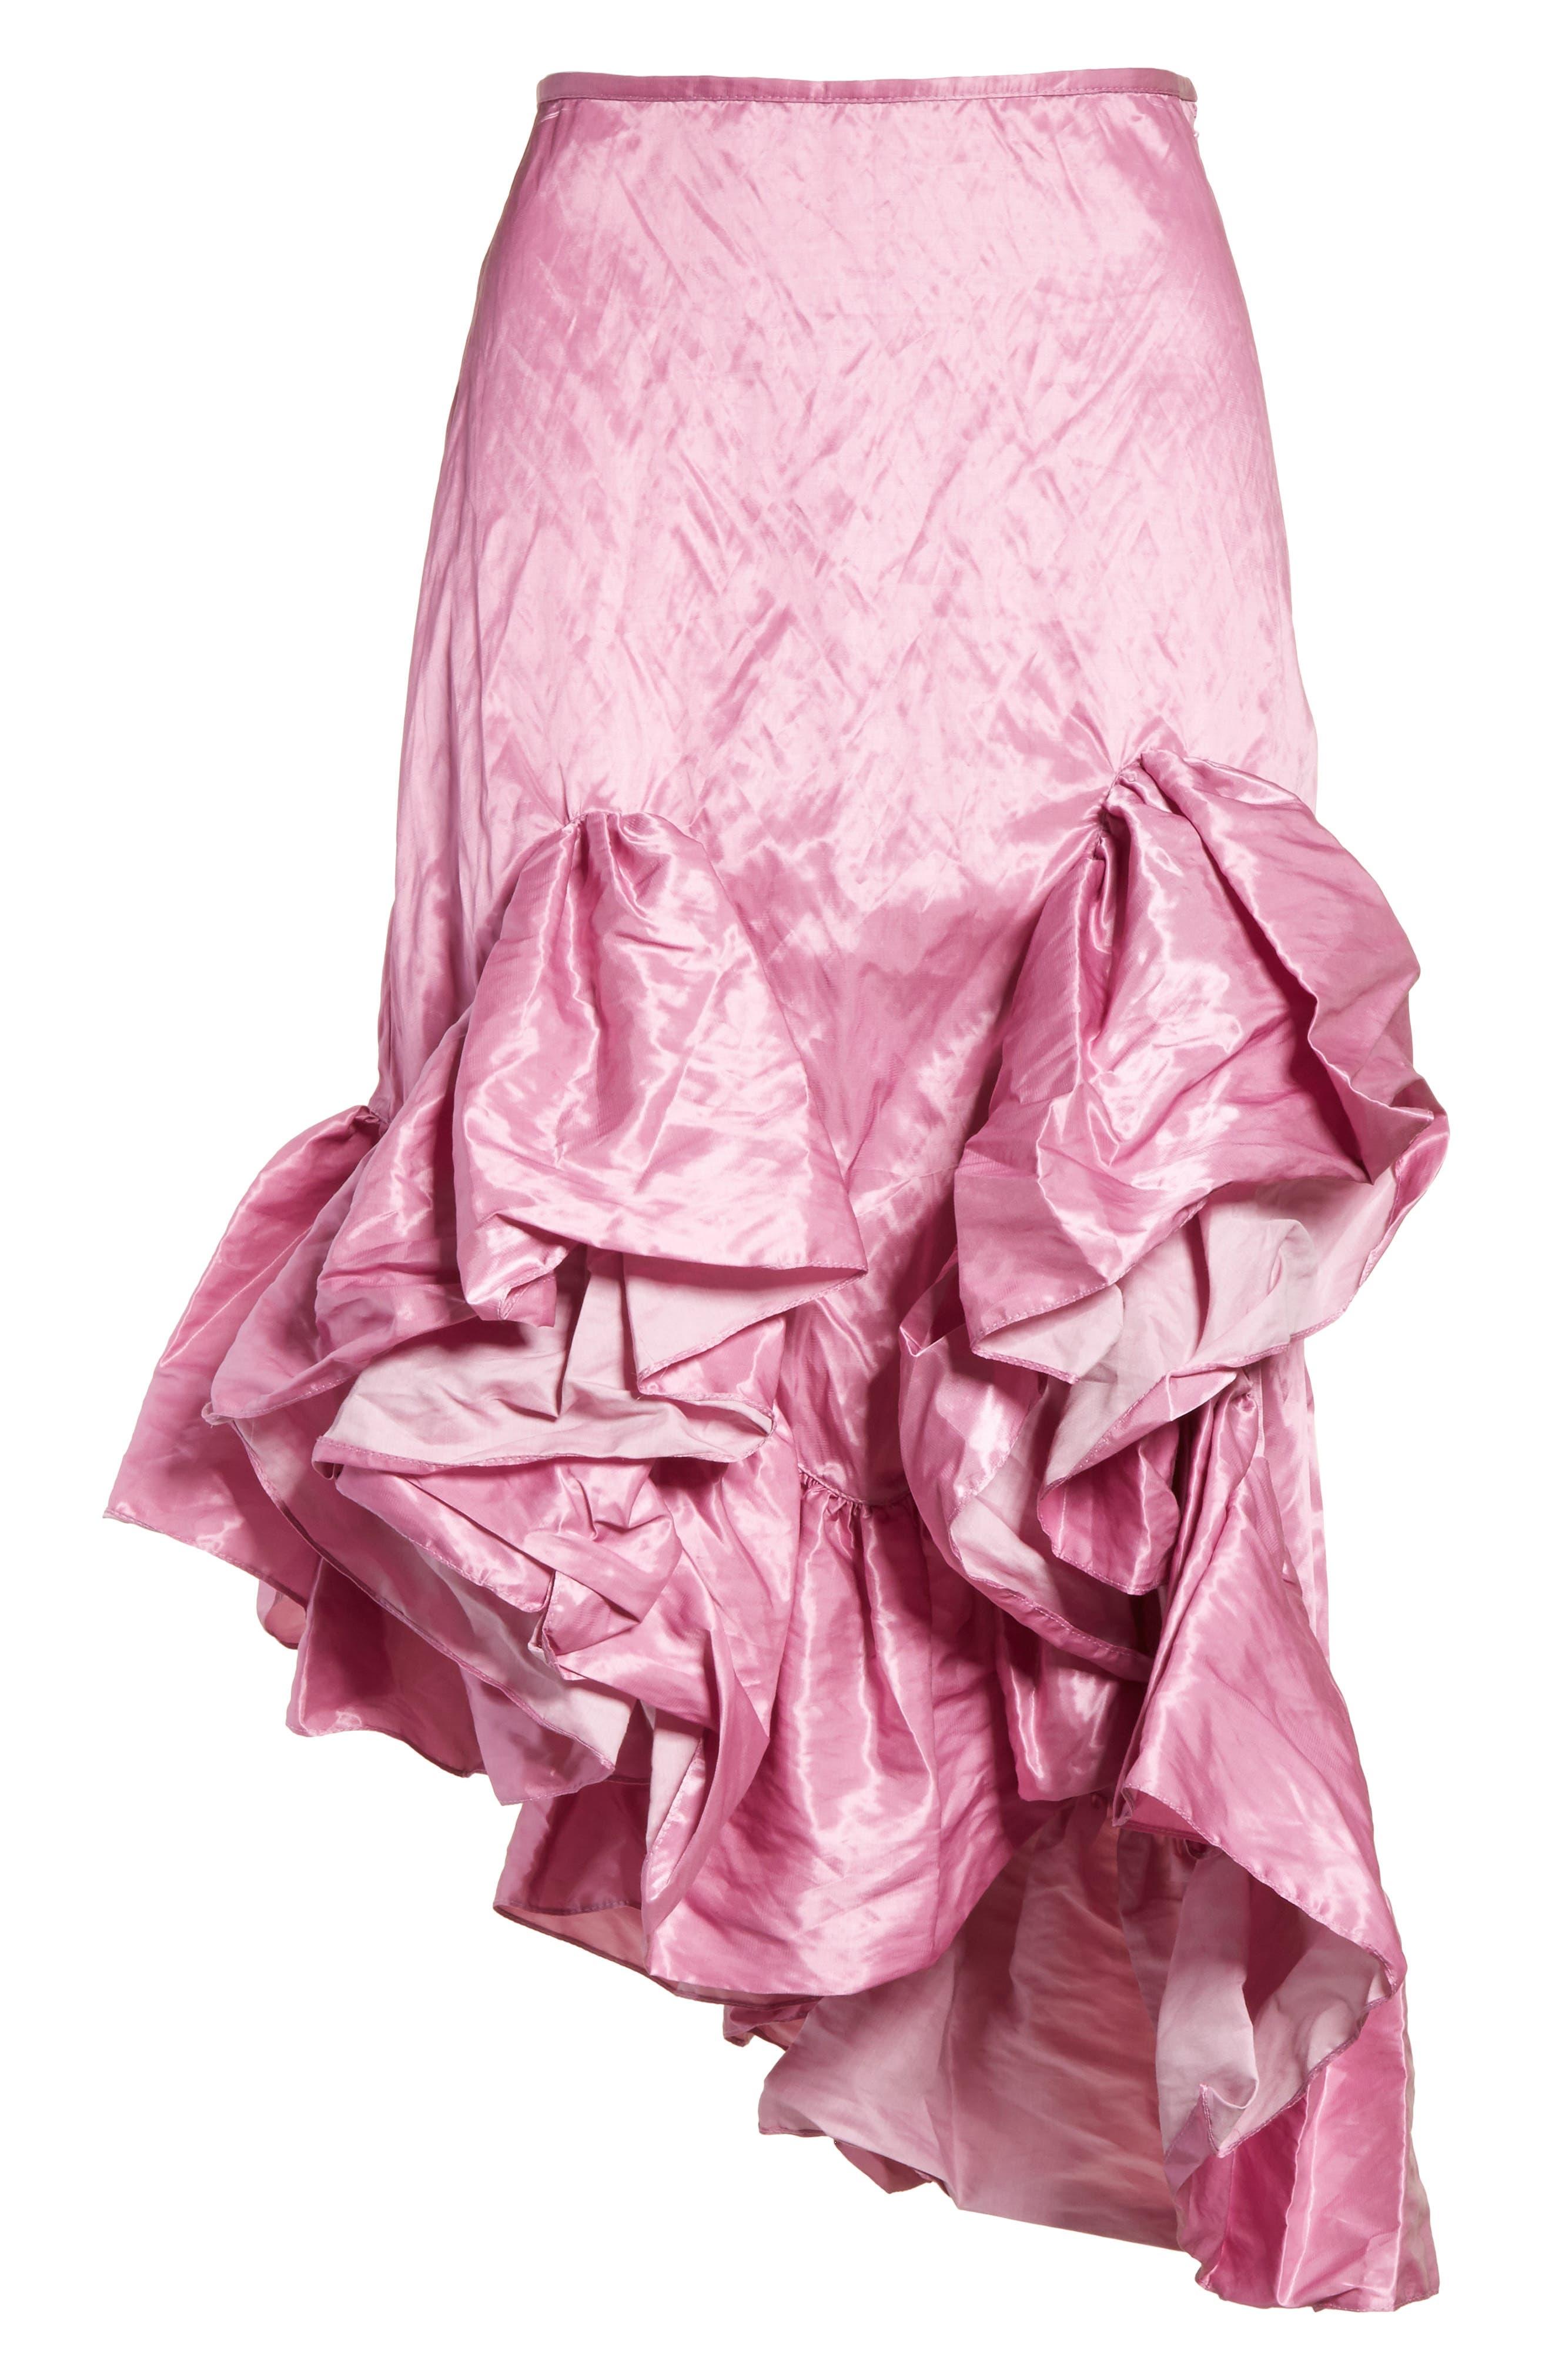 Marques'Almeida Asymmetrical Ruffle Taffeta Skirt,                             Alternate thumbnail 7, color,                             Pink